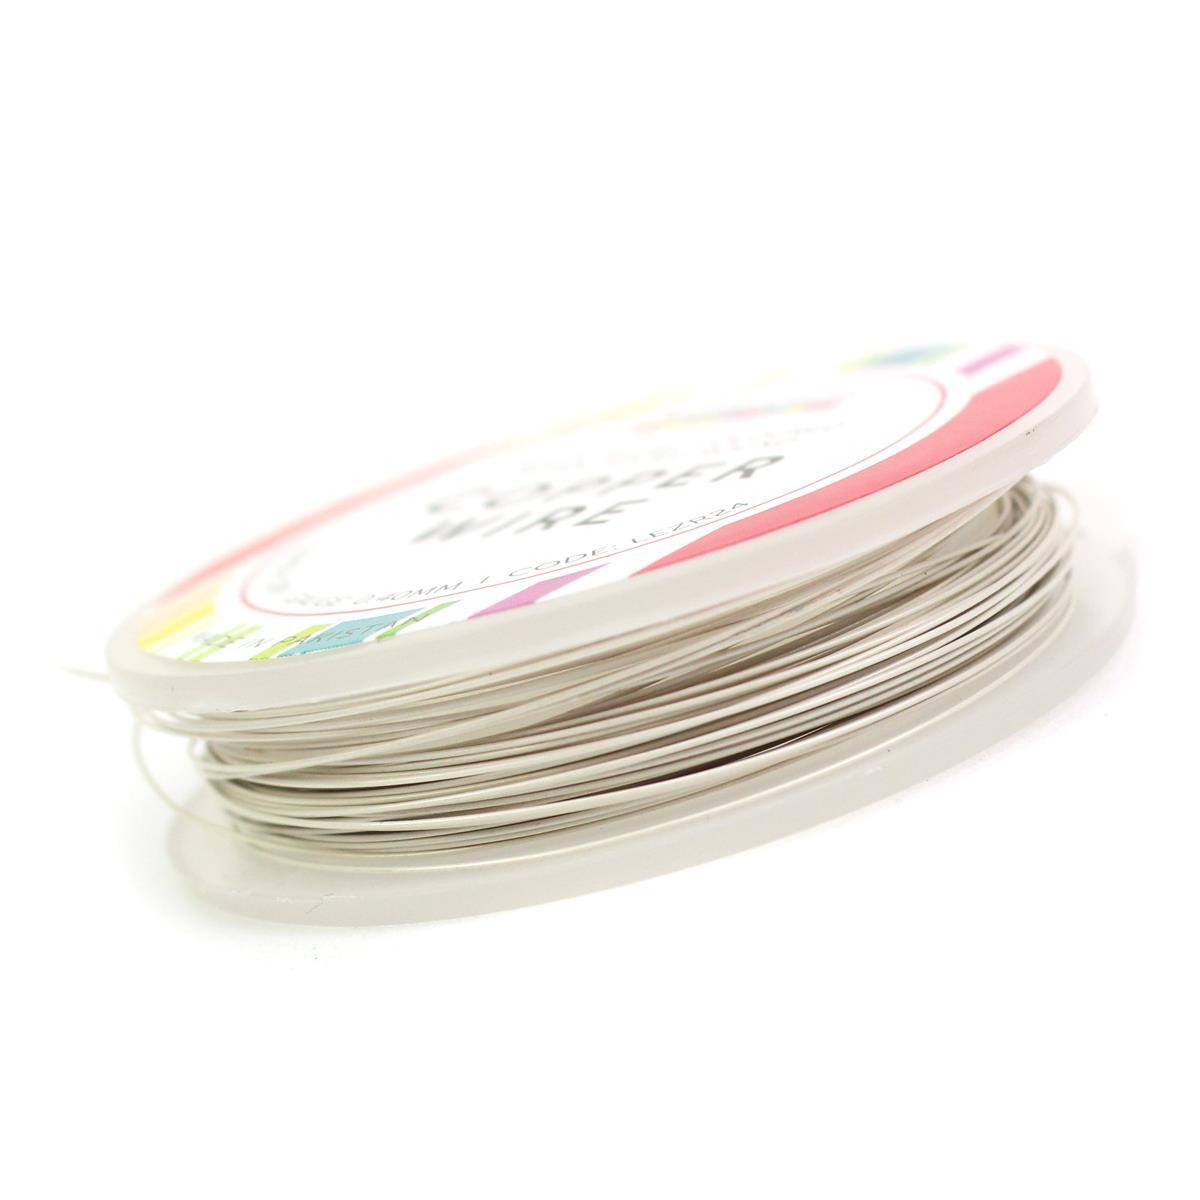 10m Silver Plated White Pastel Copper Wire 0.4mm   JewelleryMaker.com